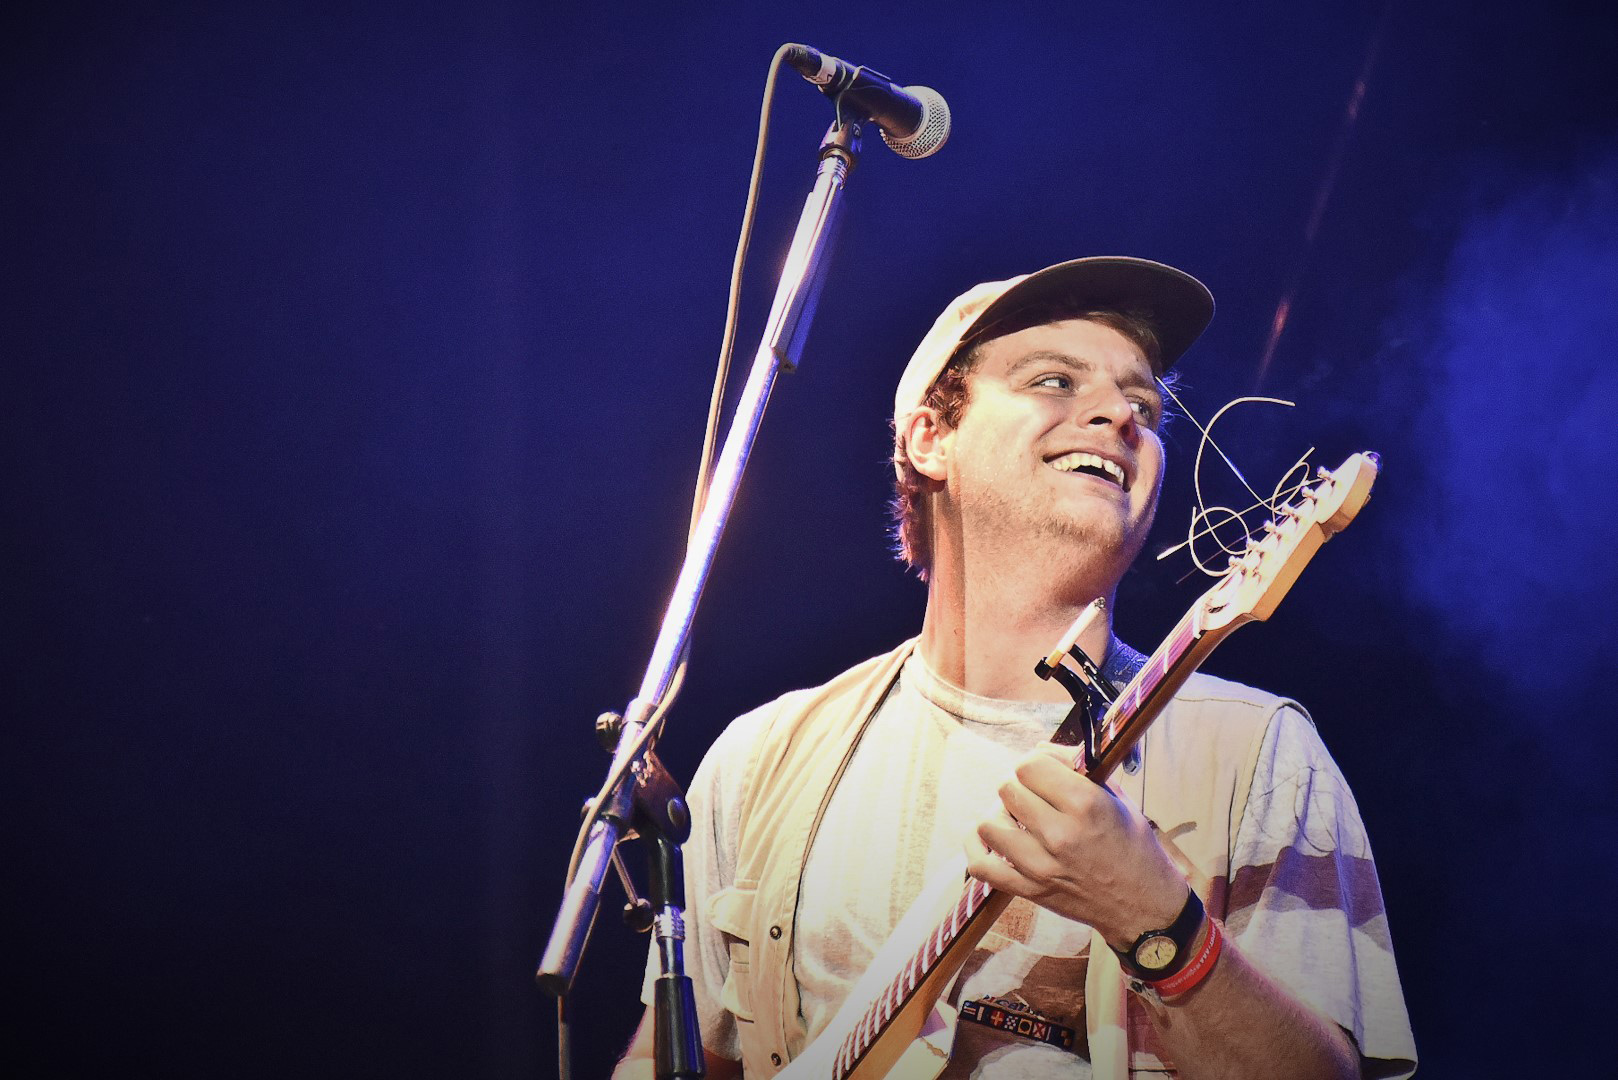 mac-demarco-music-wins-festival-tenopolis-13-noviembre-2016-victoria-mourelle-indie-hoy-1993